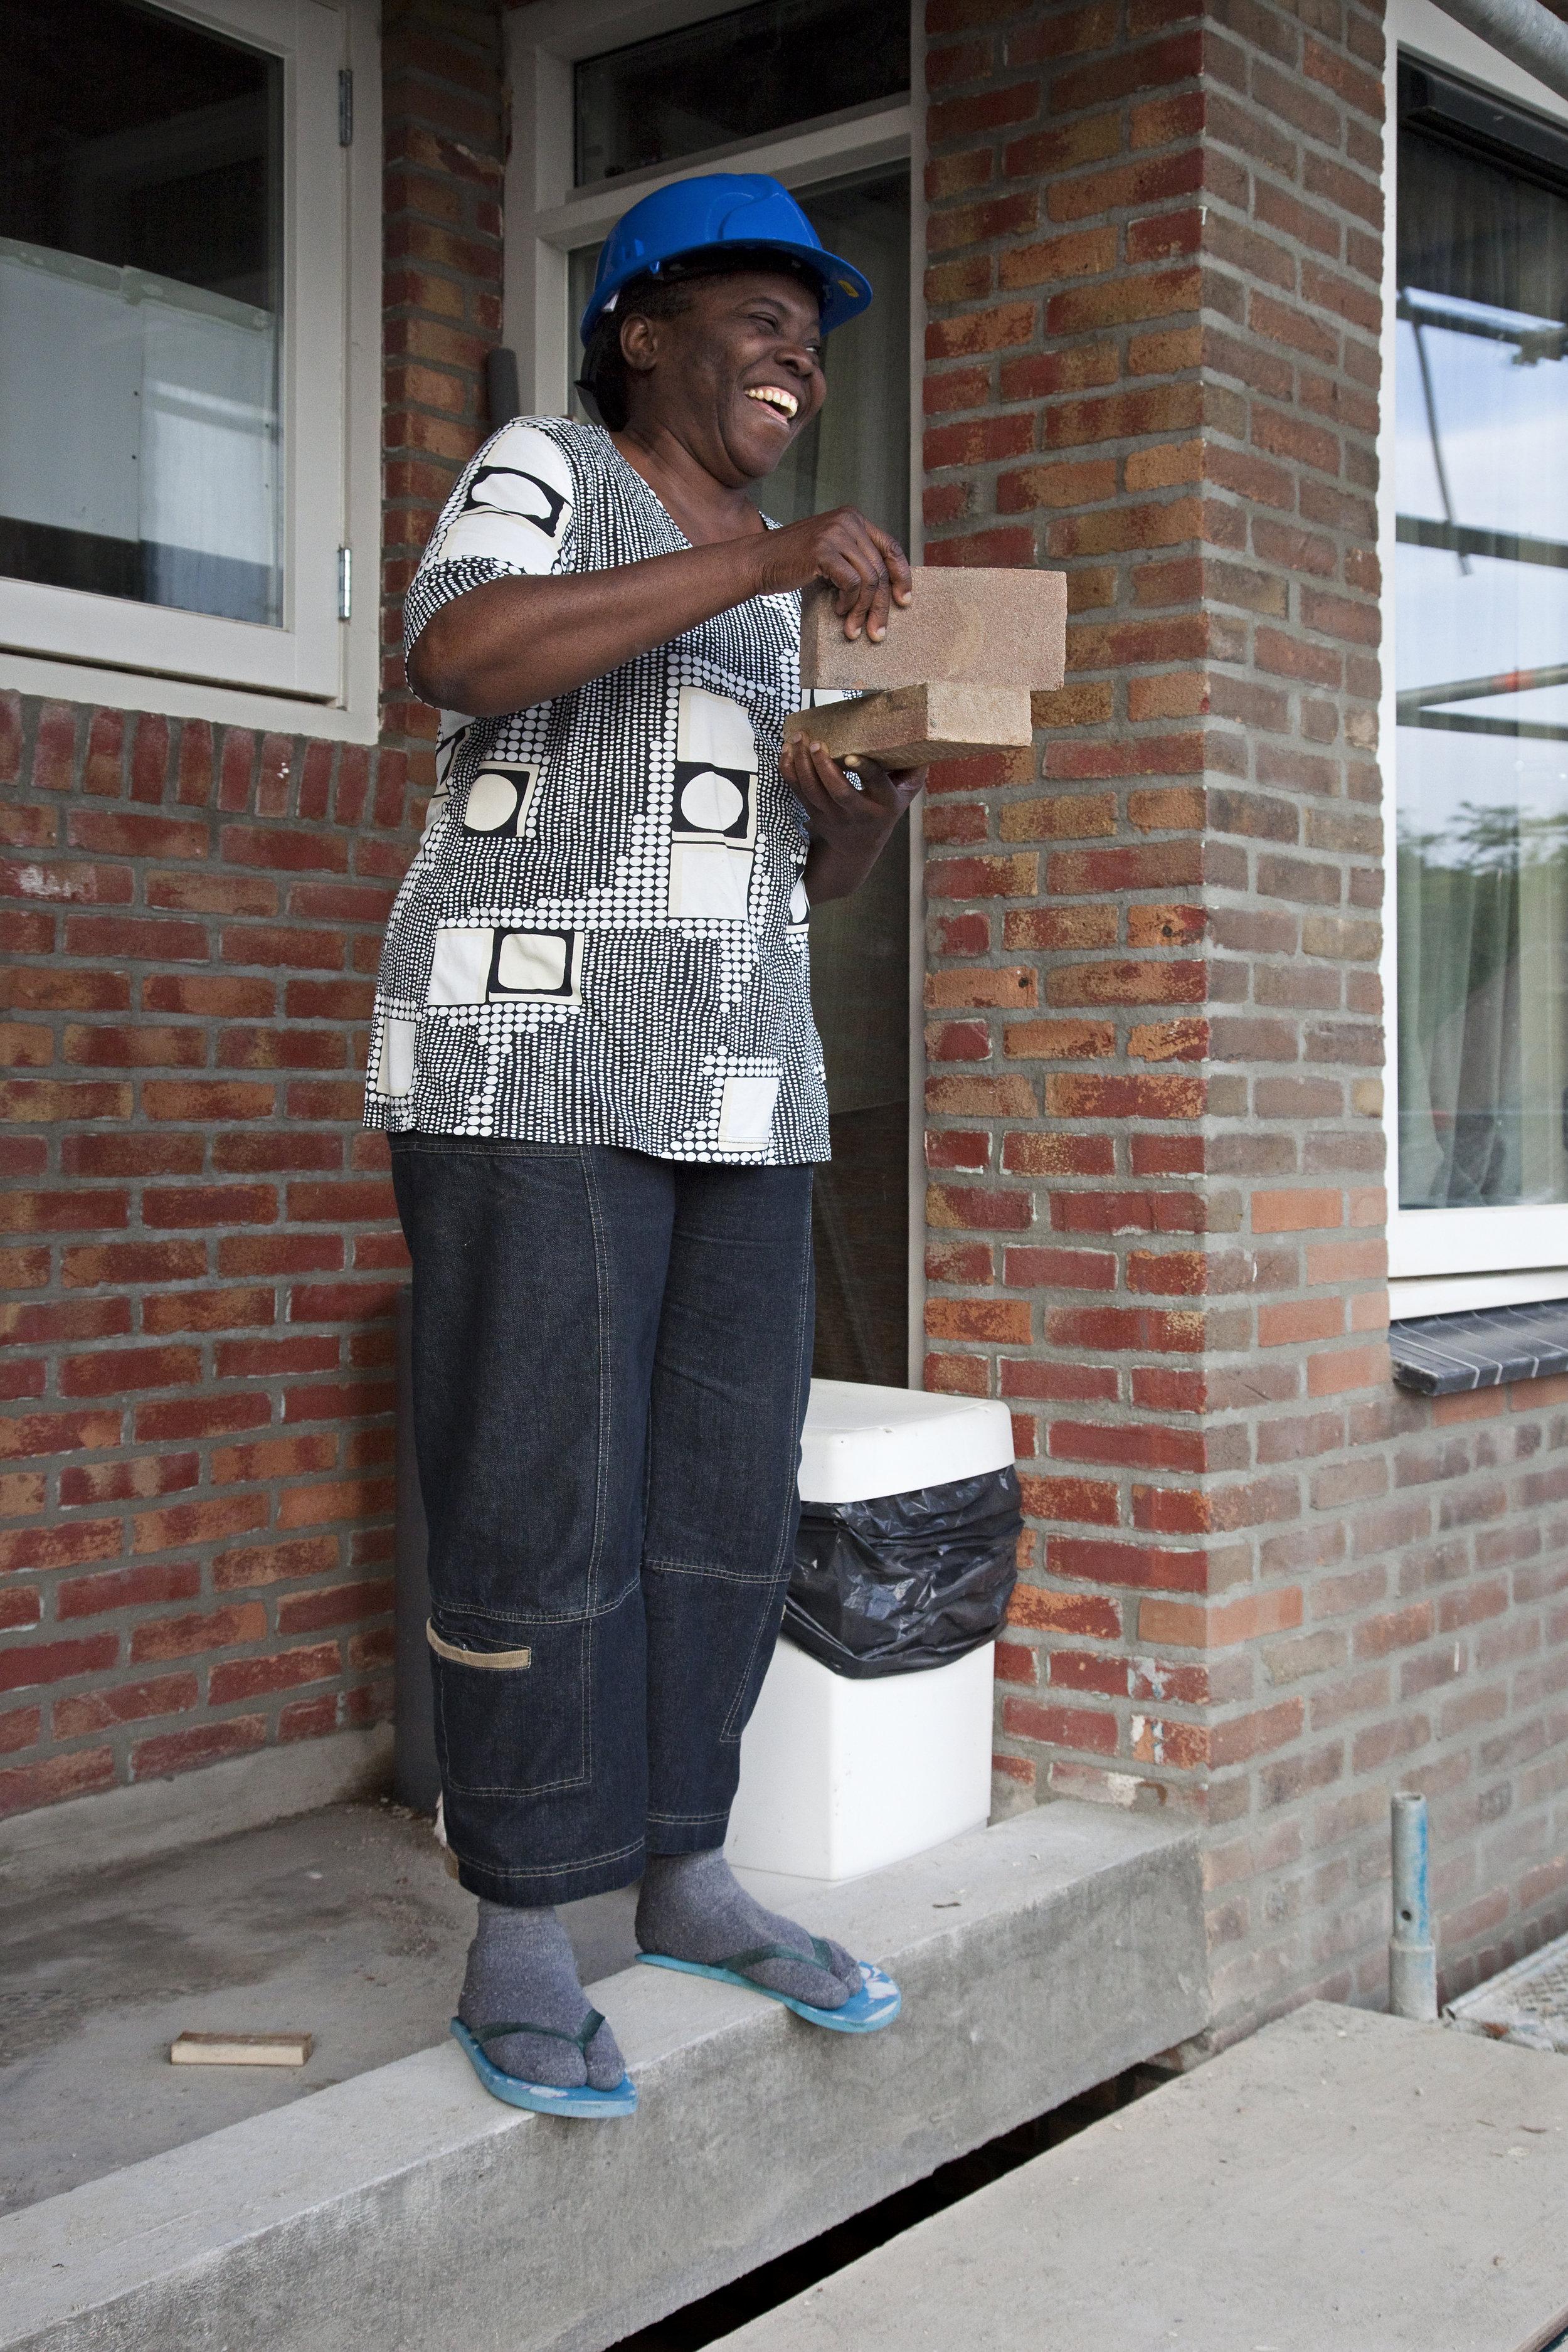 Brabant Wonen, portrettenreeks op ansichtkaarten n.a.v. grootschalig onderhoud 56 woningen